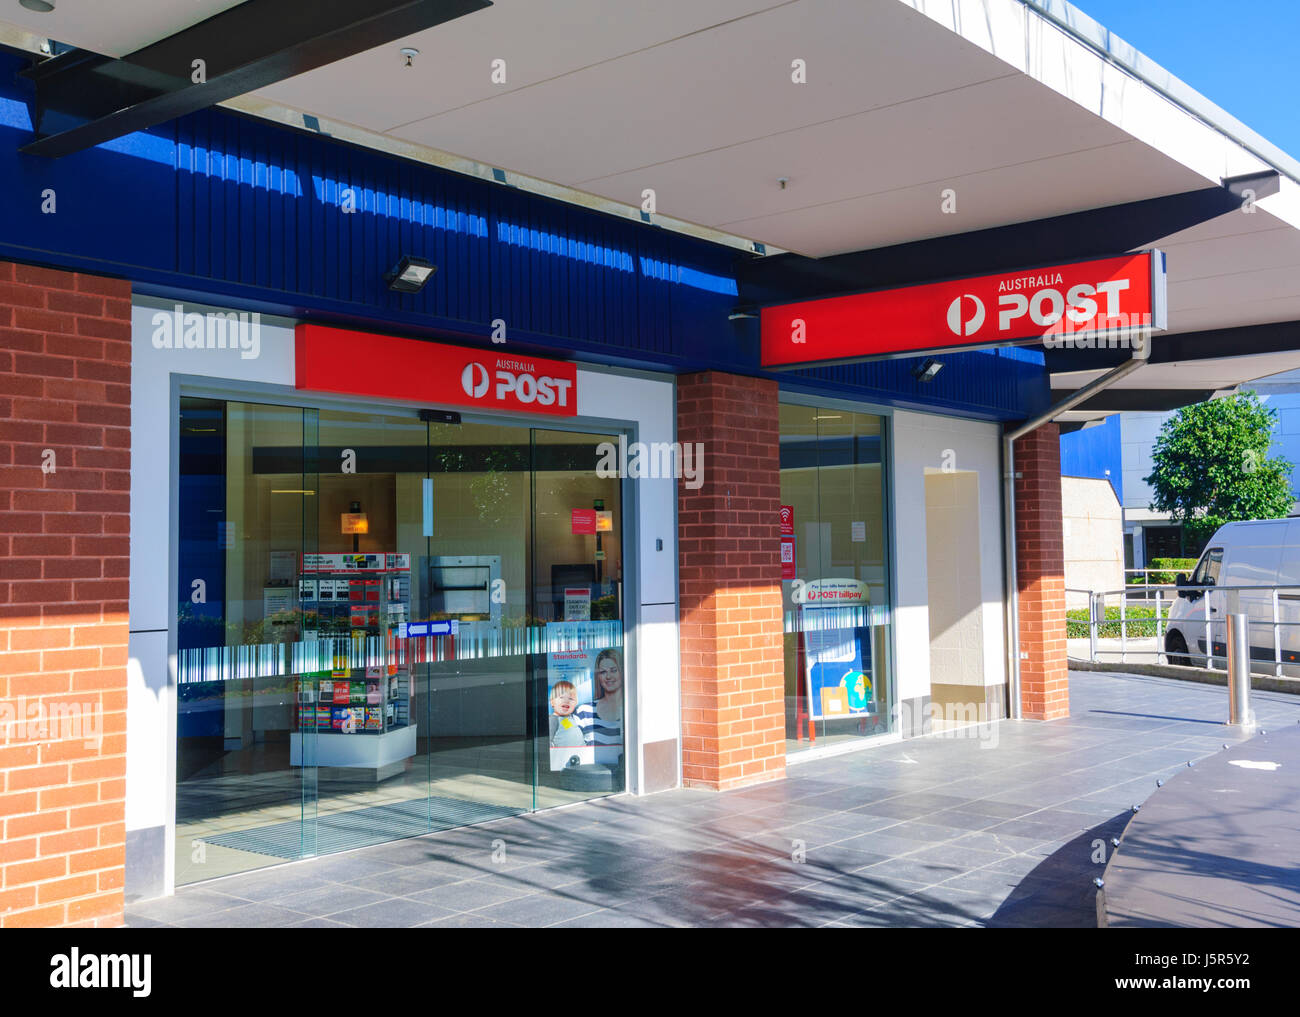 australia-post-office-at-shellharbour-ne